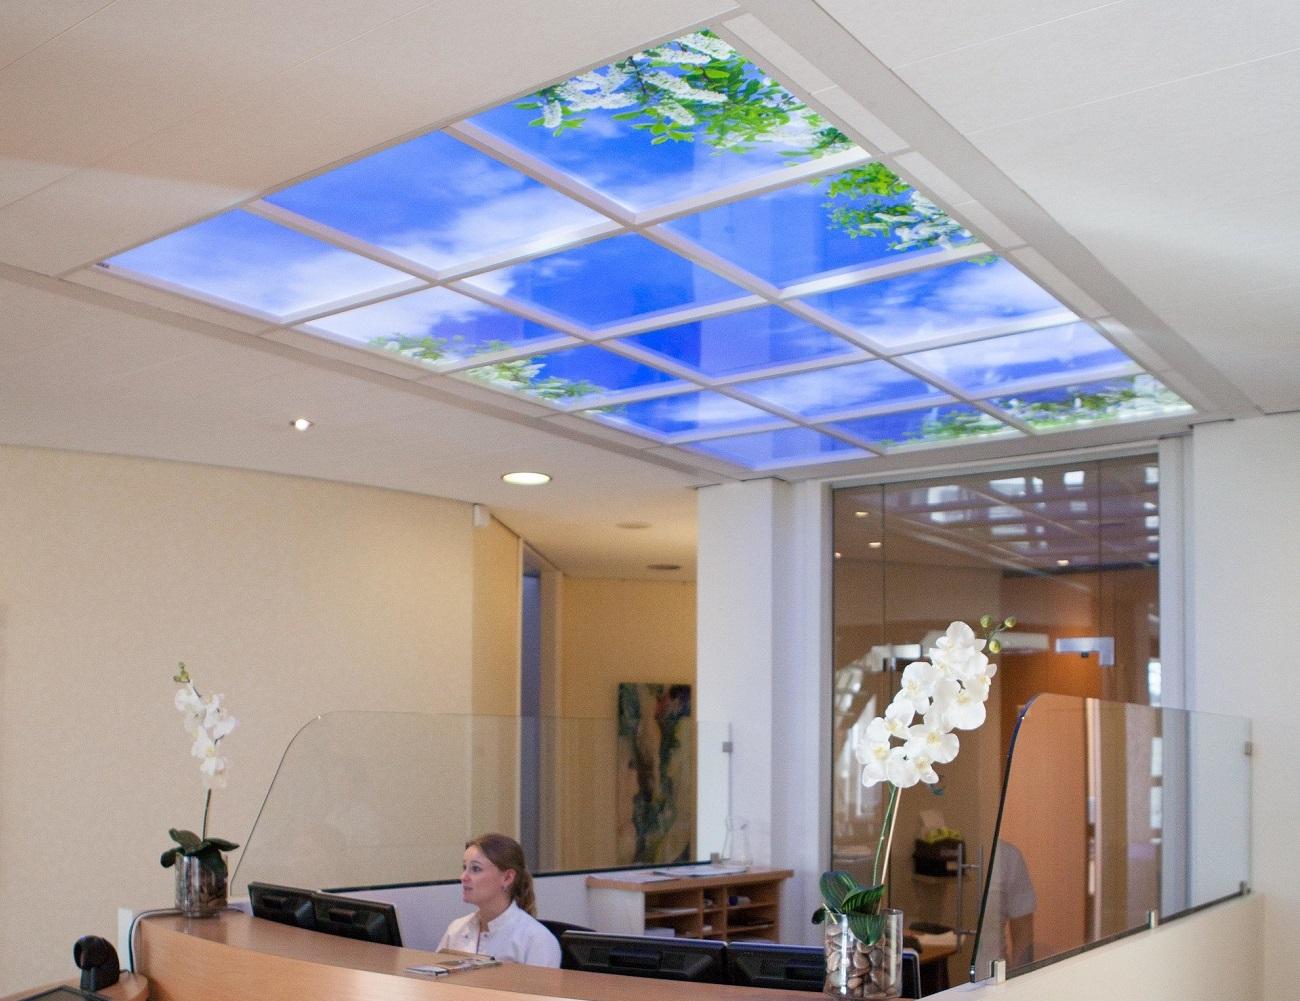 Sky mural ceiling panels gadget flow for Ceiling mural sky